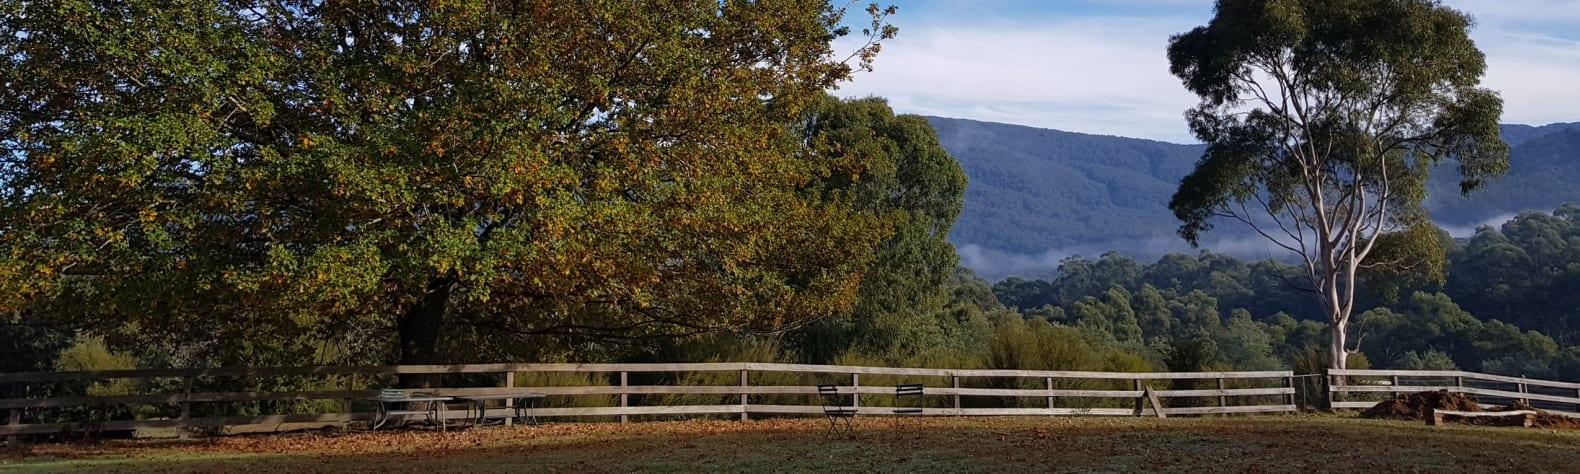 Iron Brook Donkey Farm